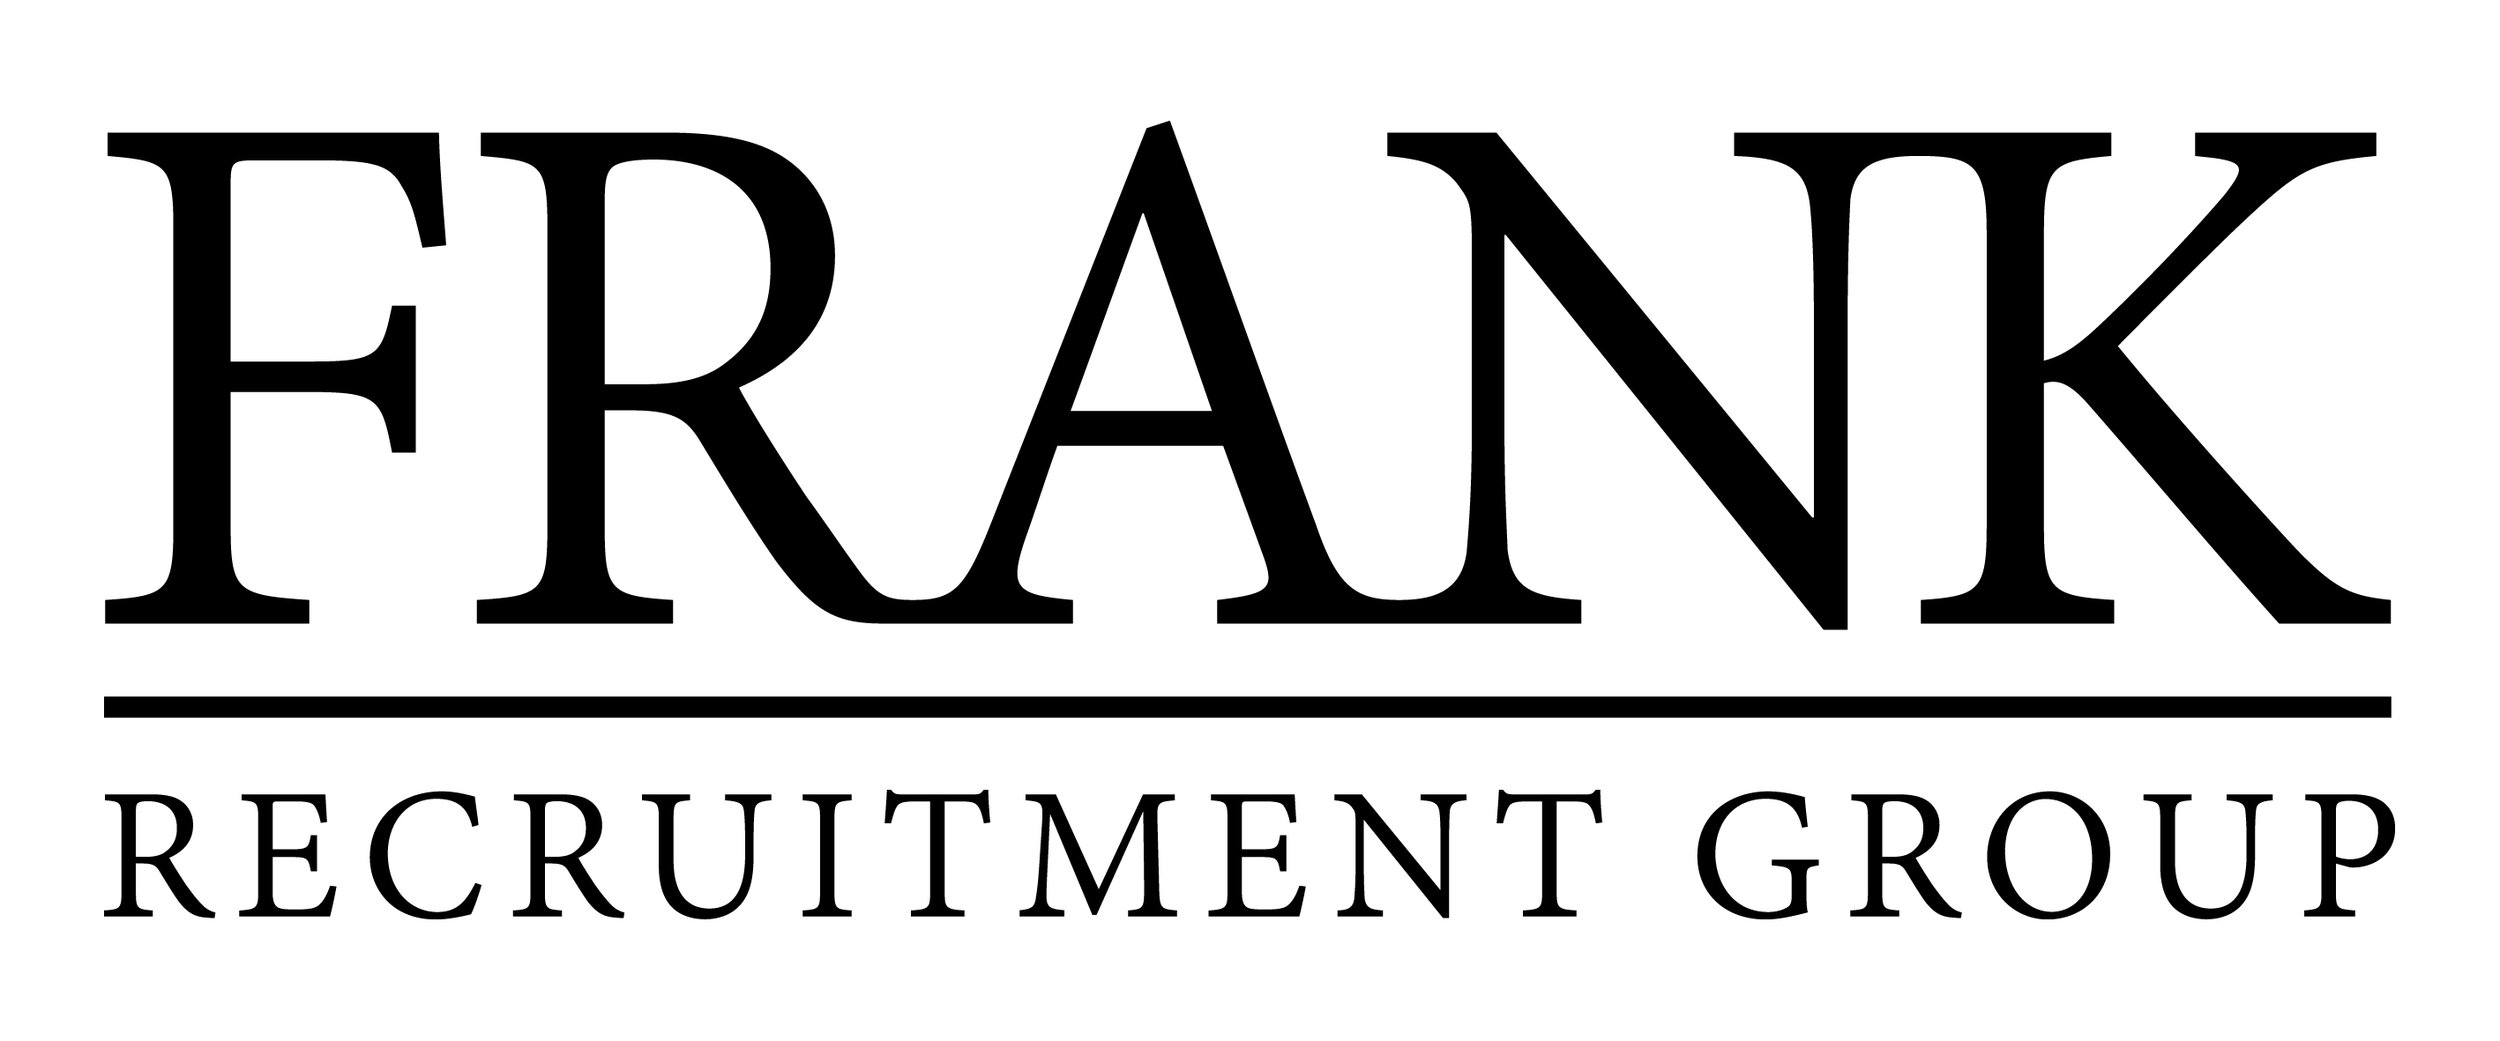 Frank-Group-logo.jpg